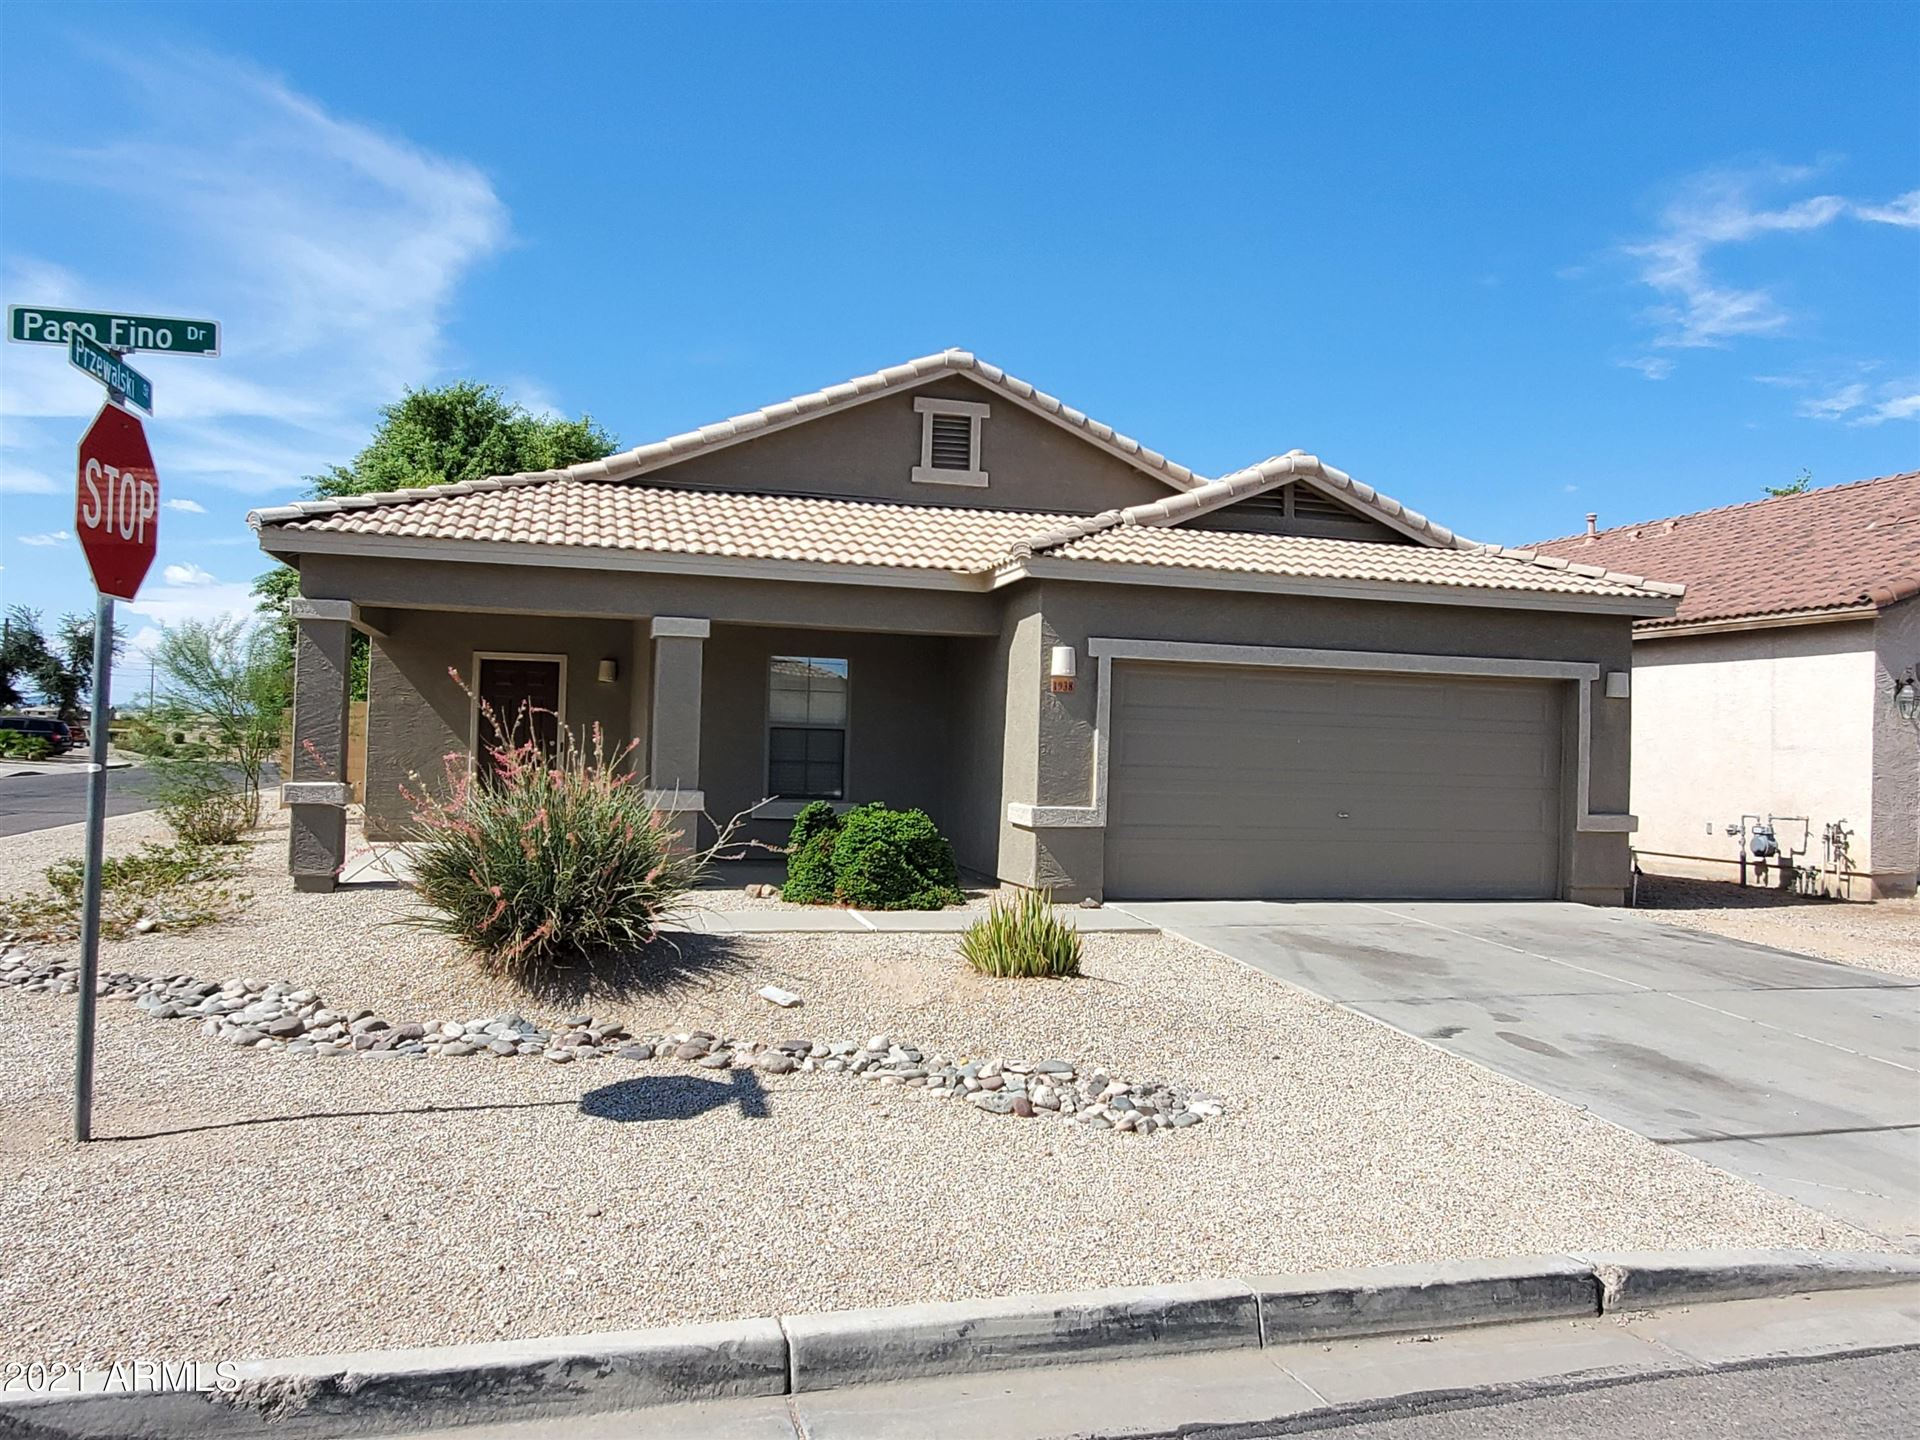 Photo of 1938 E PASO FINO Drive, San Tan Valley, AZ 85140 (MLS # 6268833)